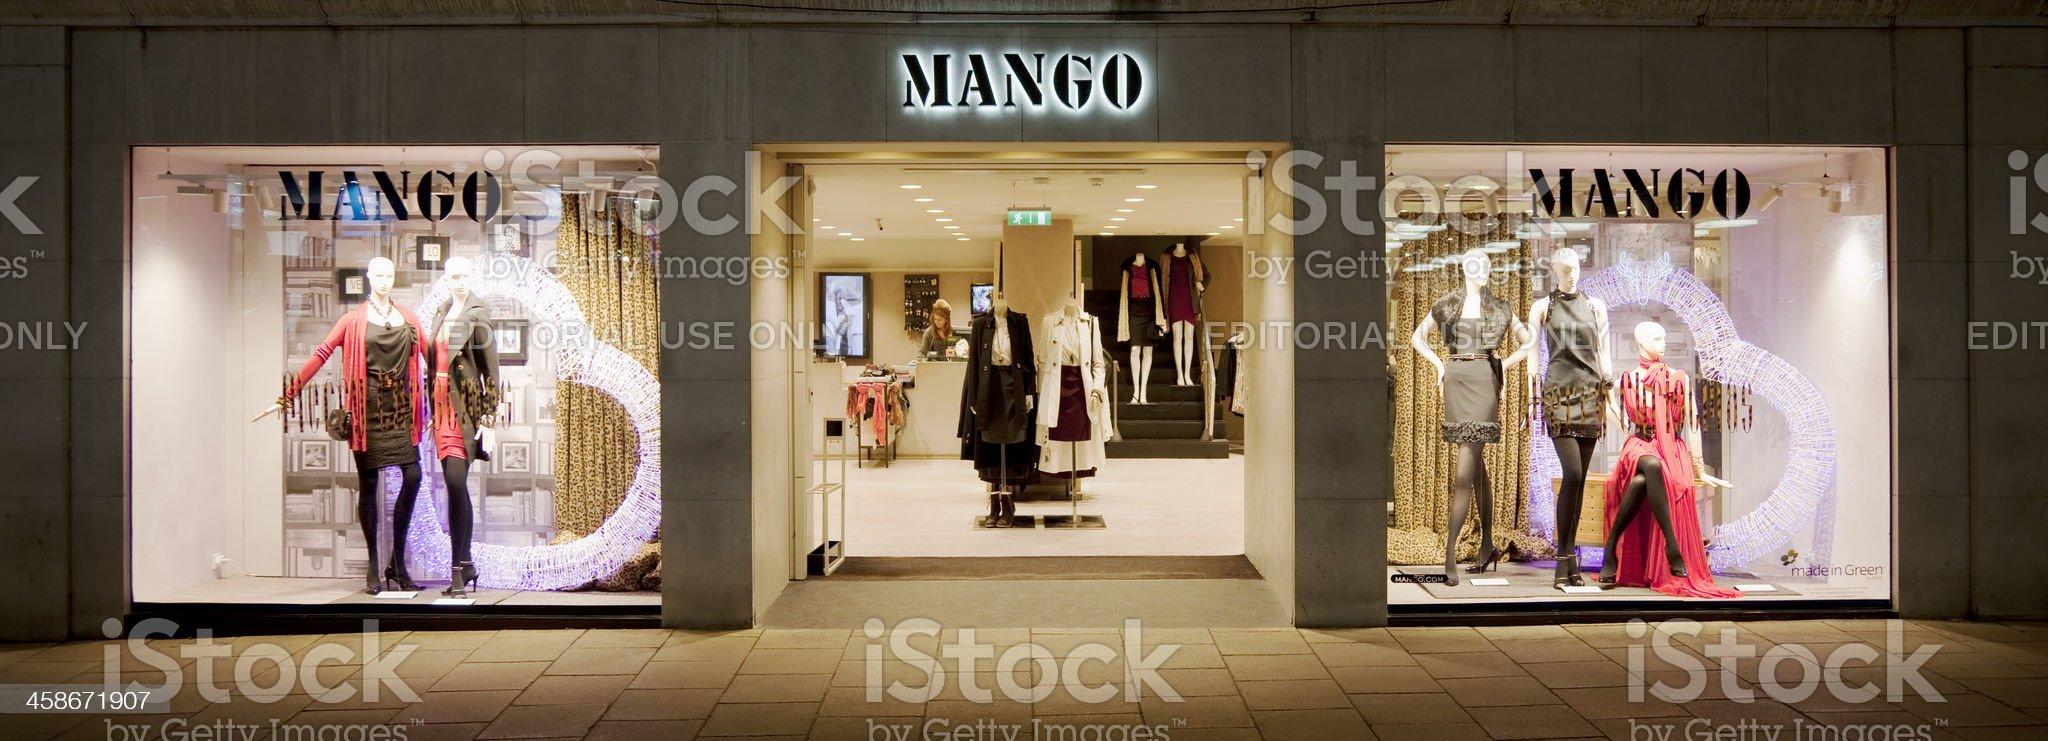 Mango clothing store shop window, sign and logo royalty-free stock photo